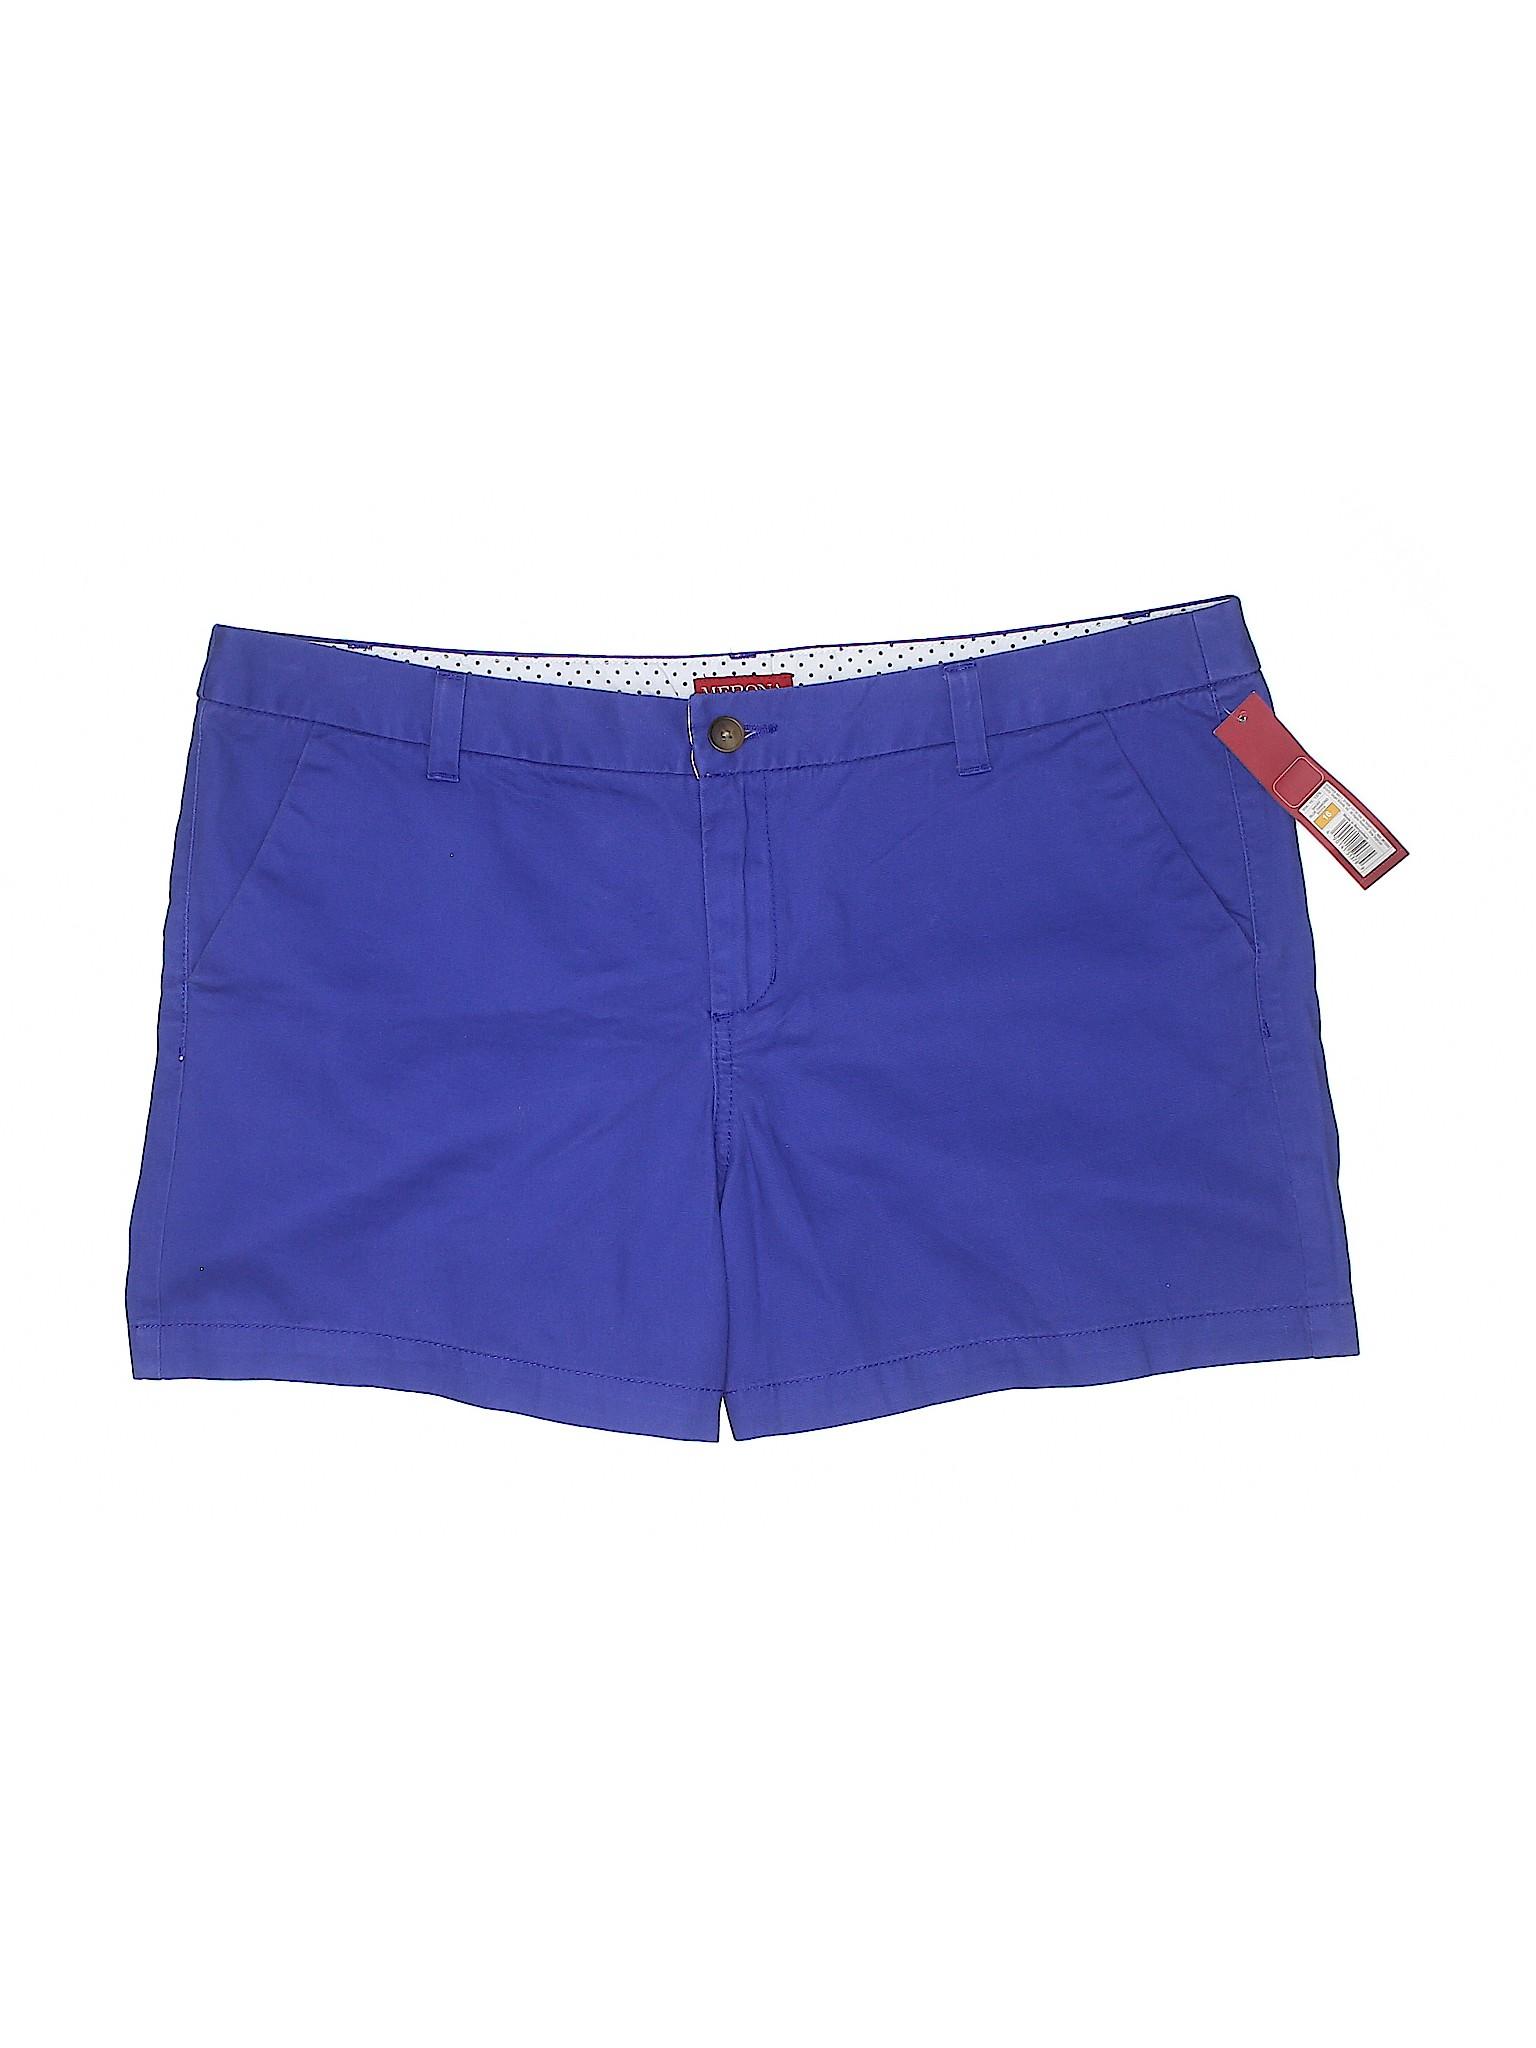 Boutique Shorts Merona Shorts Merona Shorts Boutique Merona Boutique Boutique Boutique Merona Boutique Shorts Shorts Merona tqCBBg